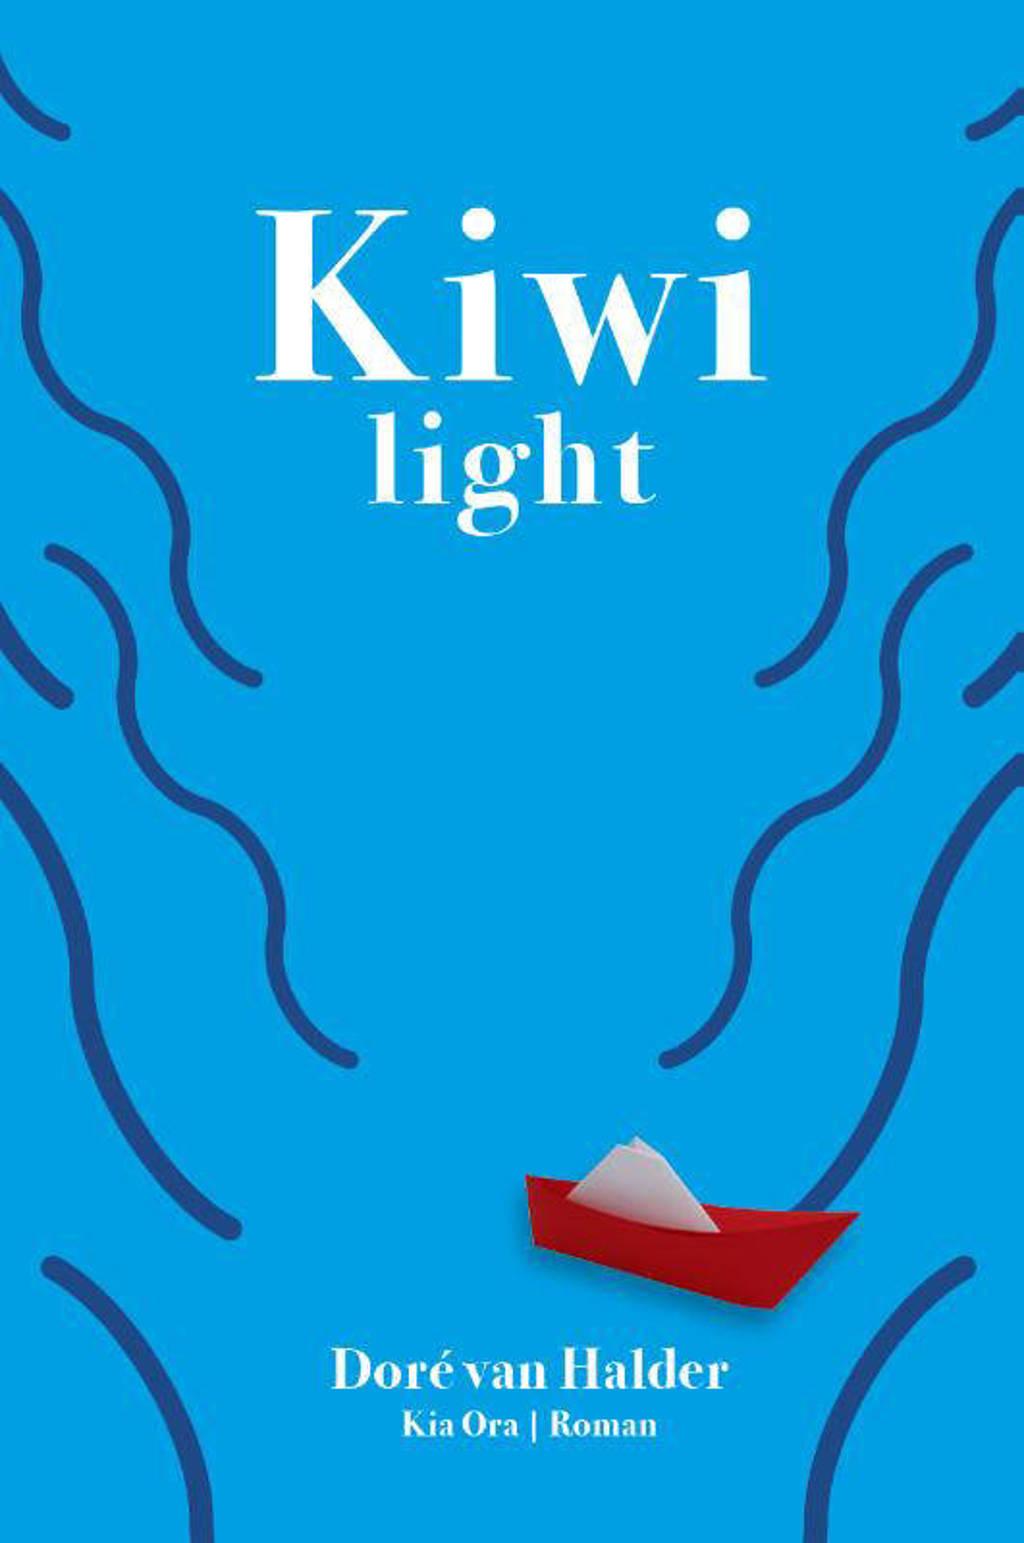 Kiwi light - Doré van Halder